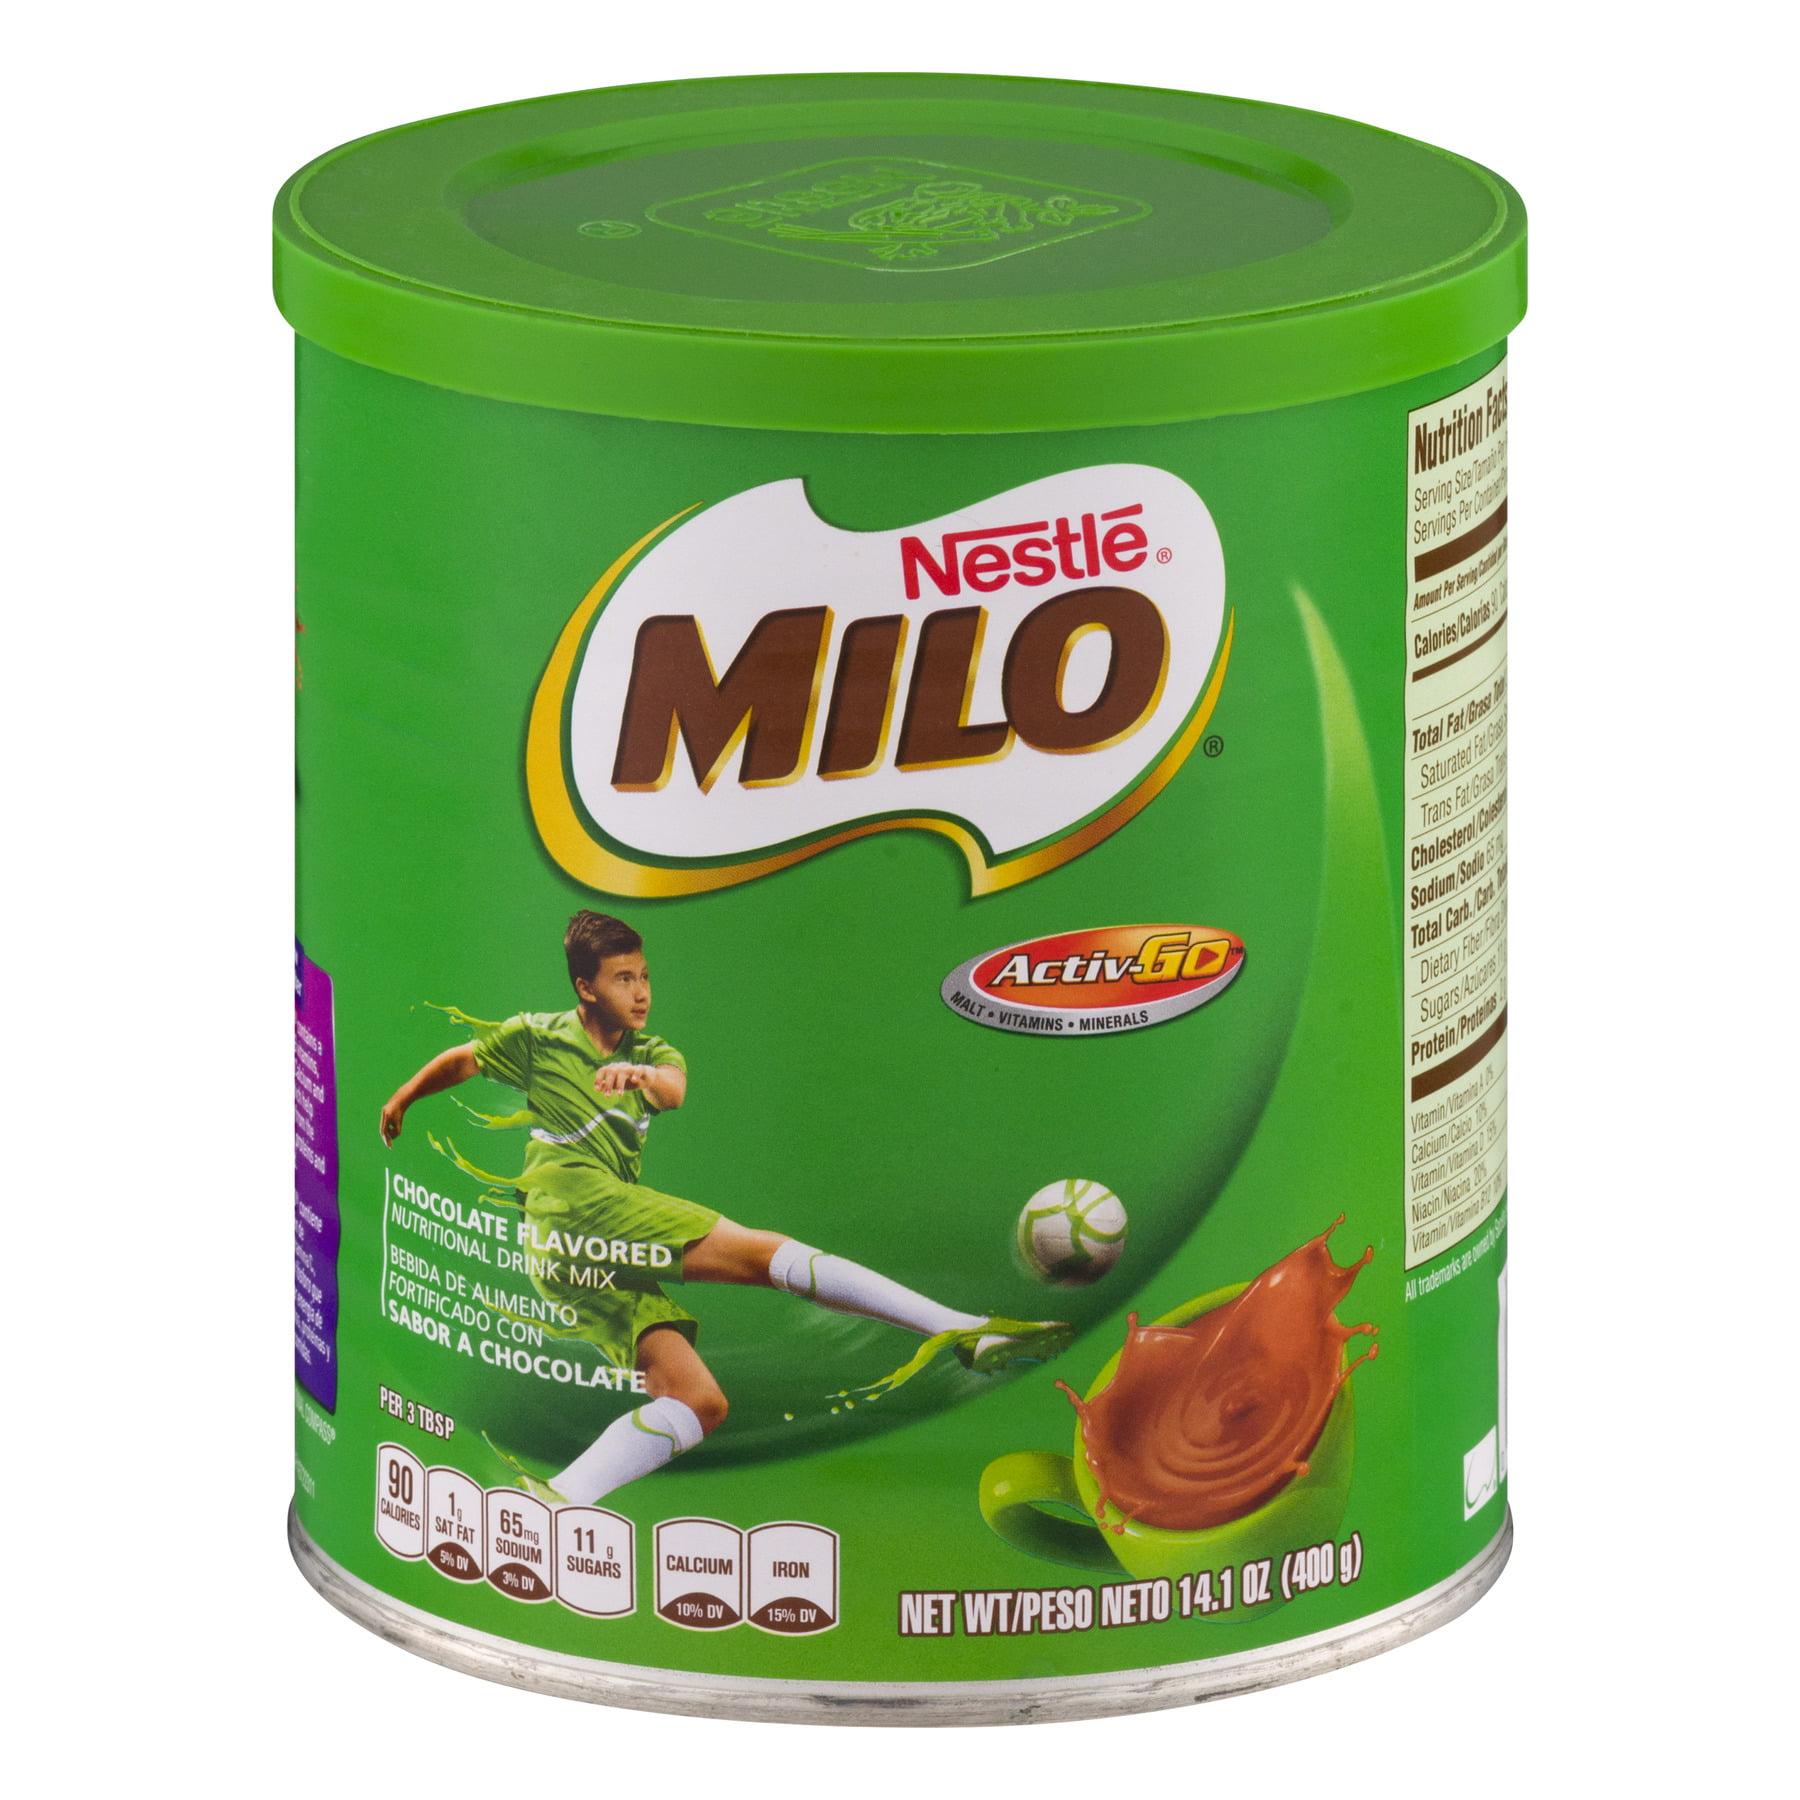 Nestle Milo Nutritional Drink Mix Chocolate, 14.1 OZ